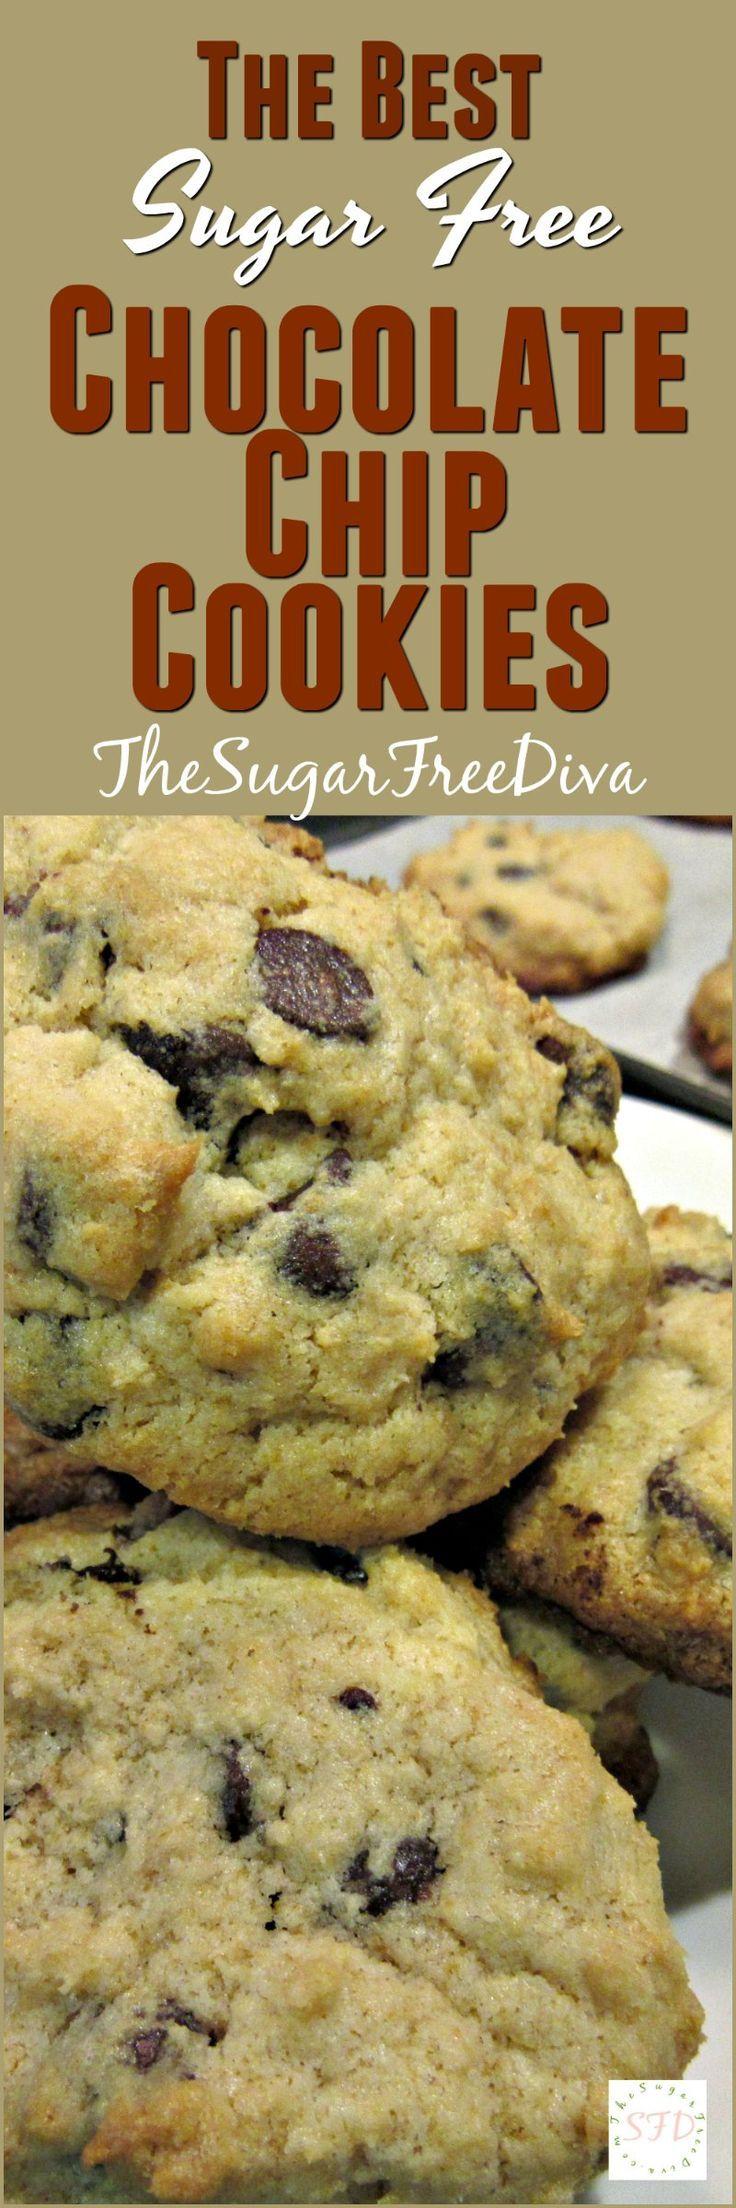 The Best Sugar Free Chocolate Chip Cookies- YUM!! This recipe is so good too!!! #chocolate #cookies #dessert #easy #sugarfree #recipe